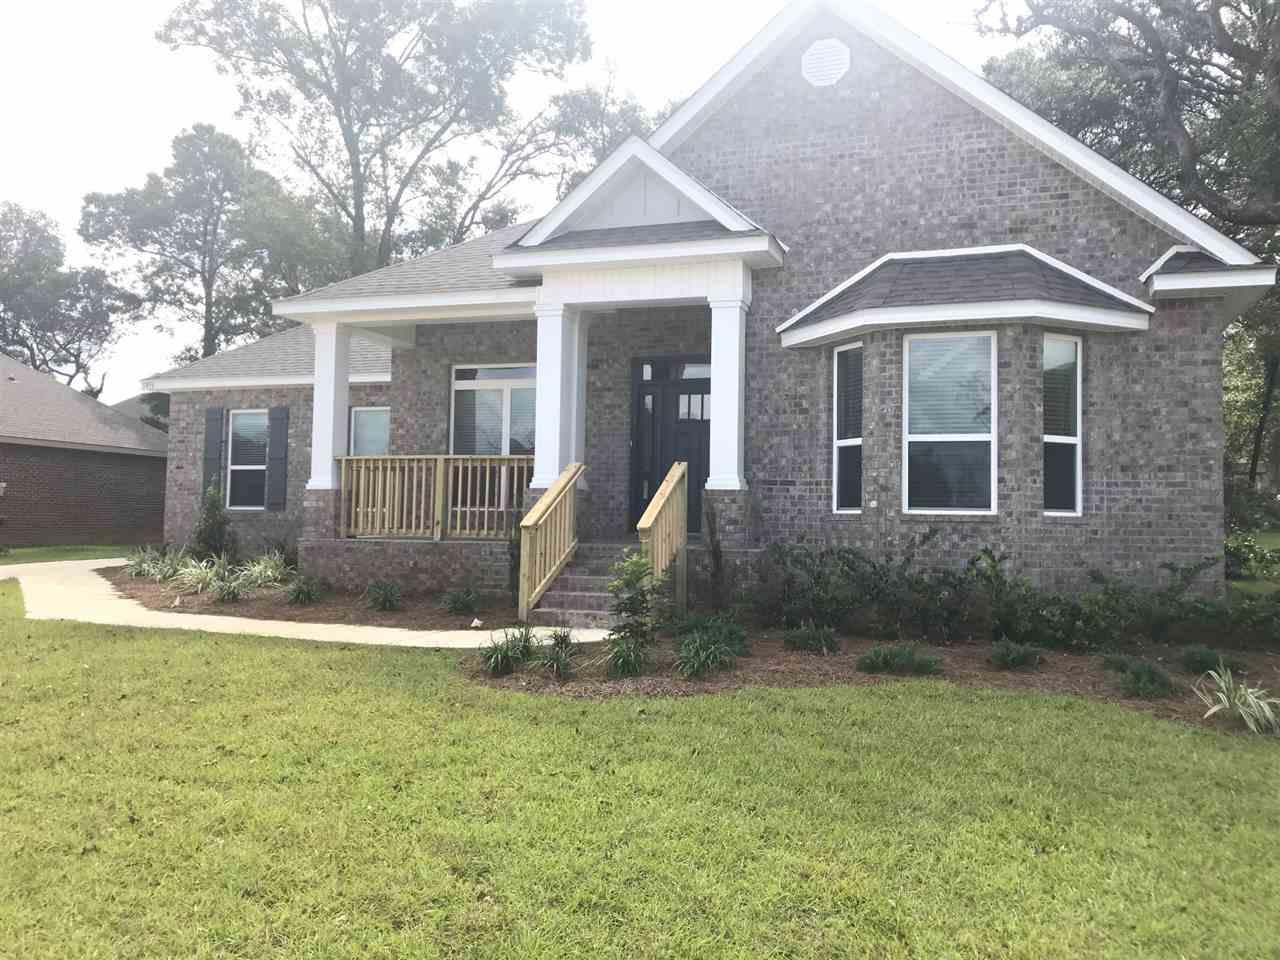 5896 Huntington Creek Blvd, Pensacola, FL 32526